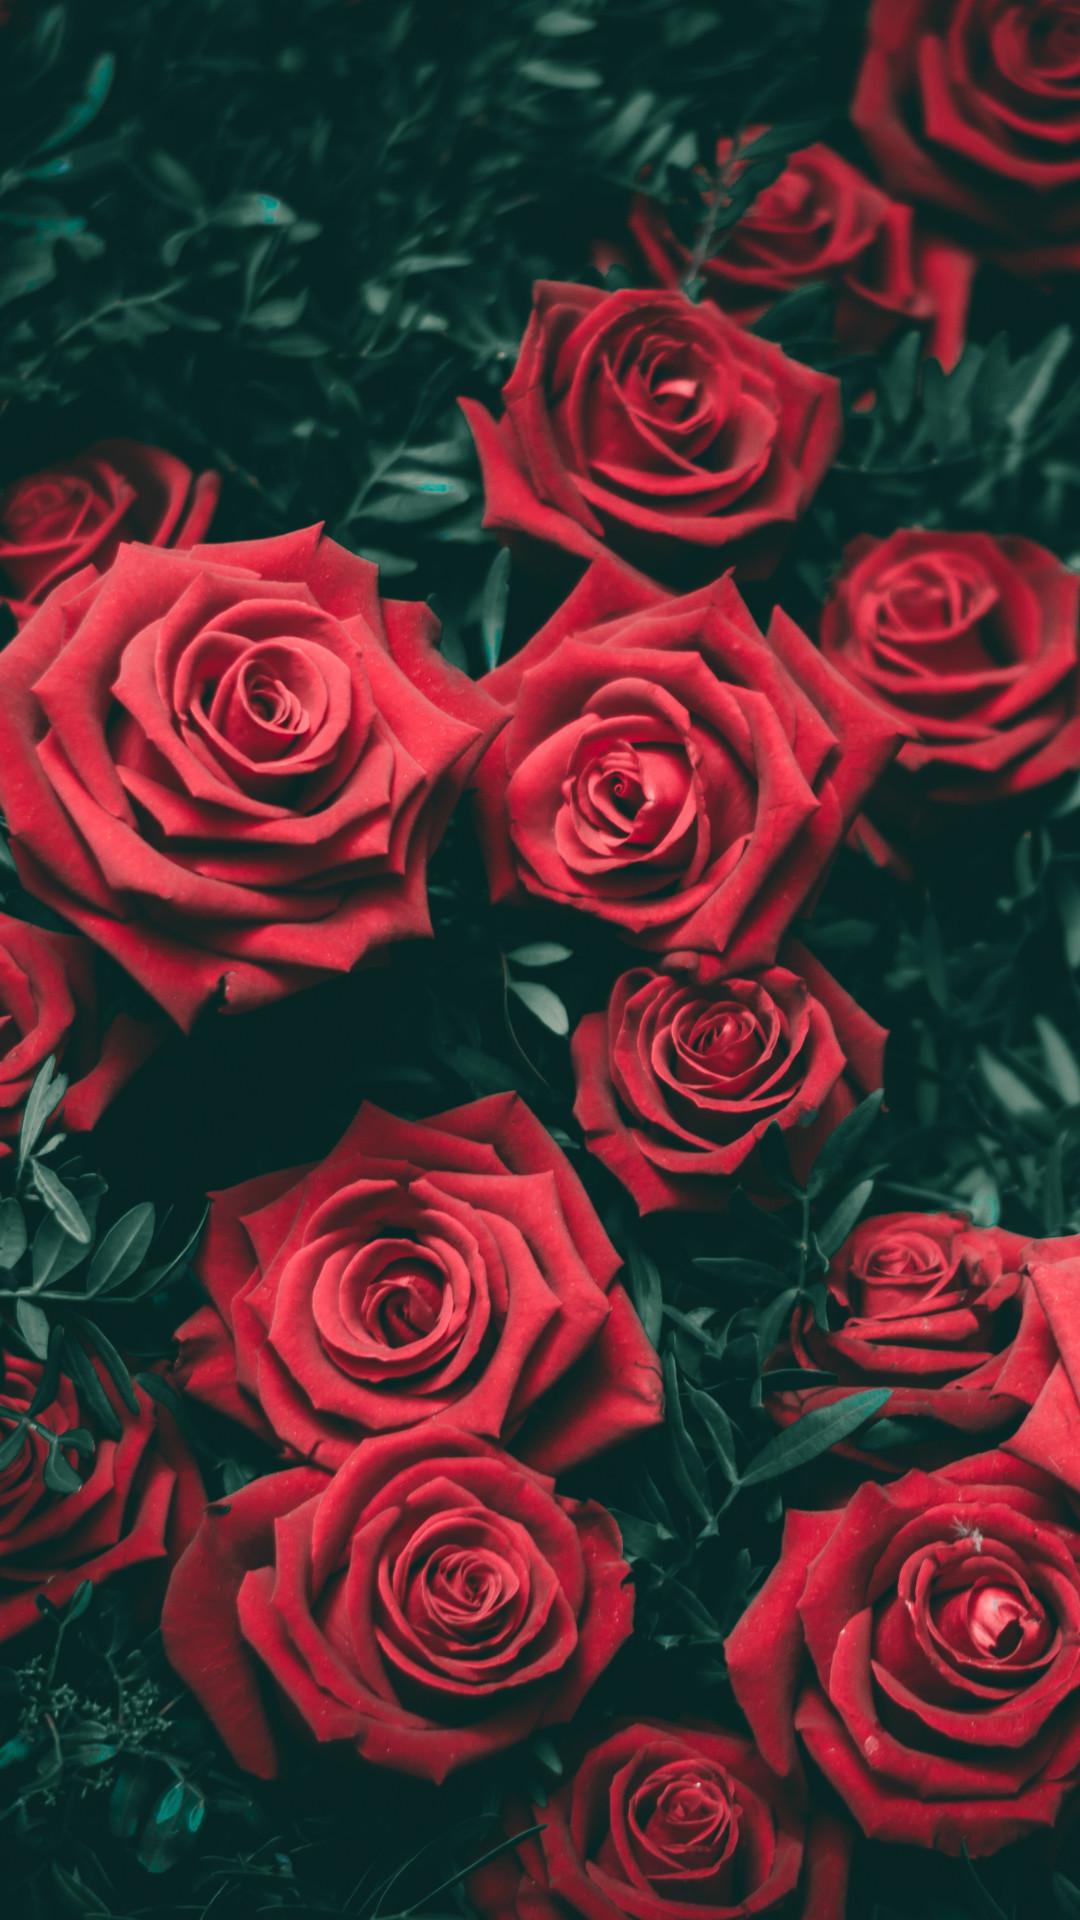 1920x1080 Red Rose Wallpapers Desktop Wallpaper